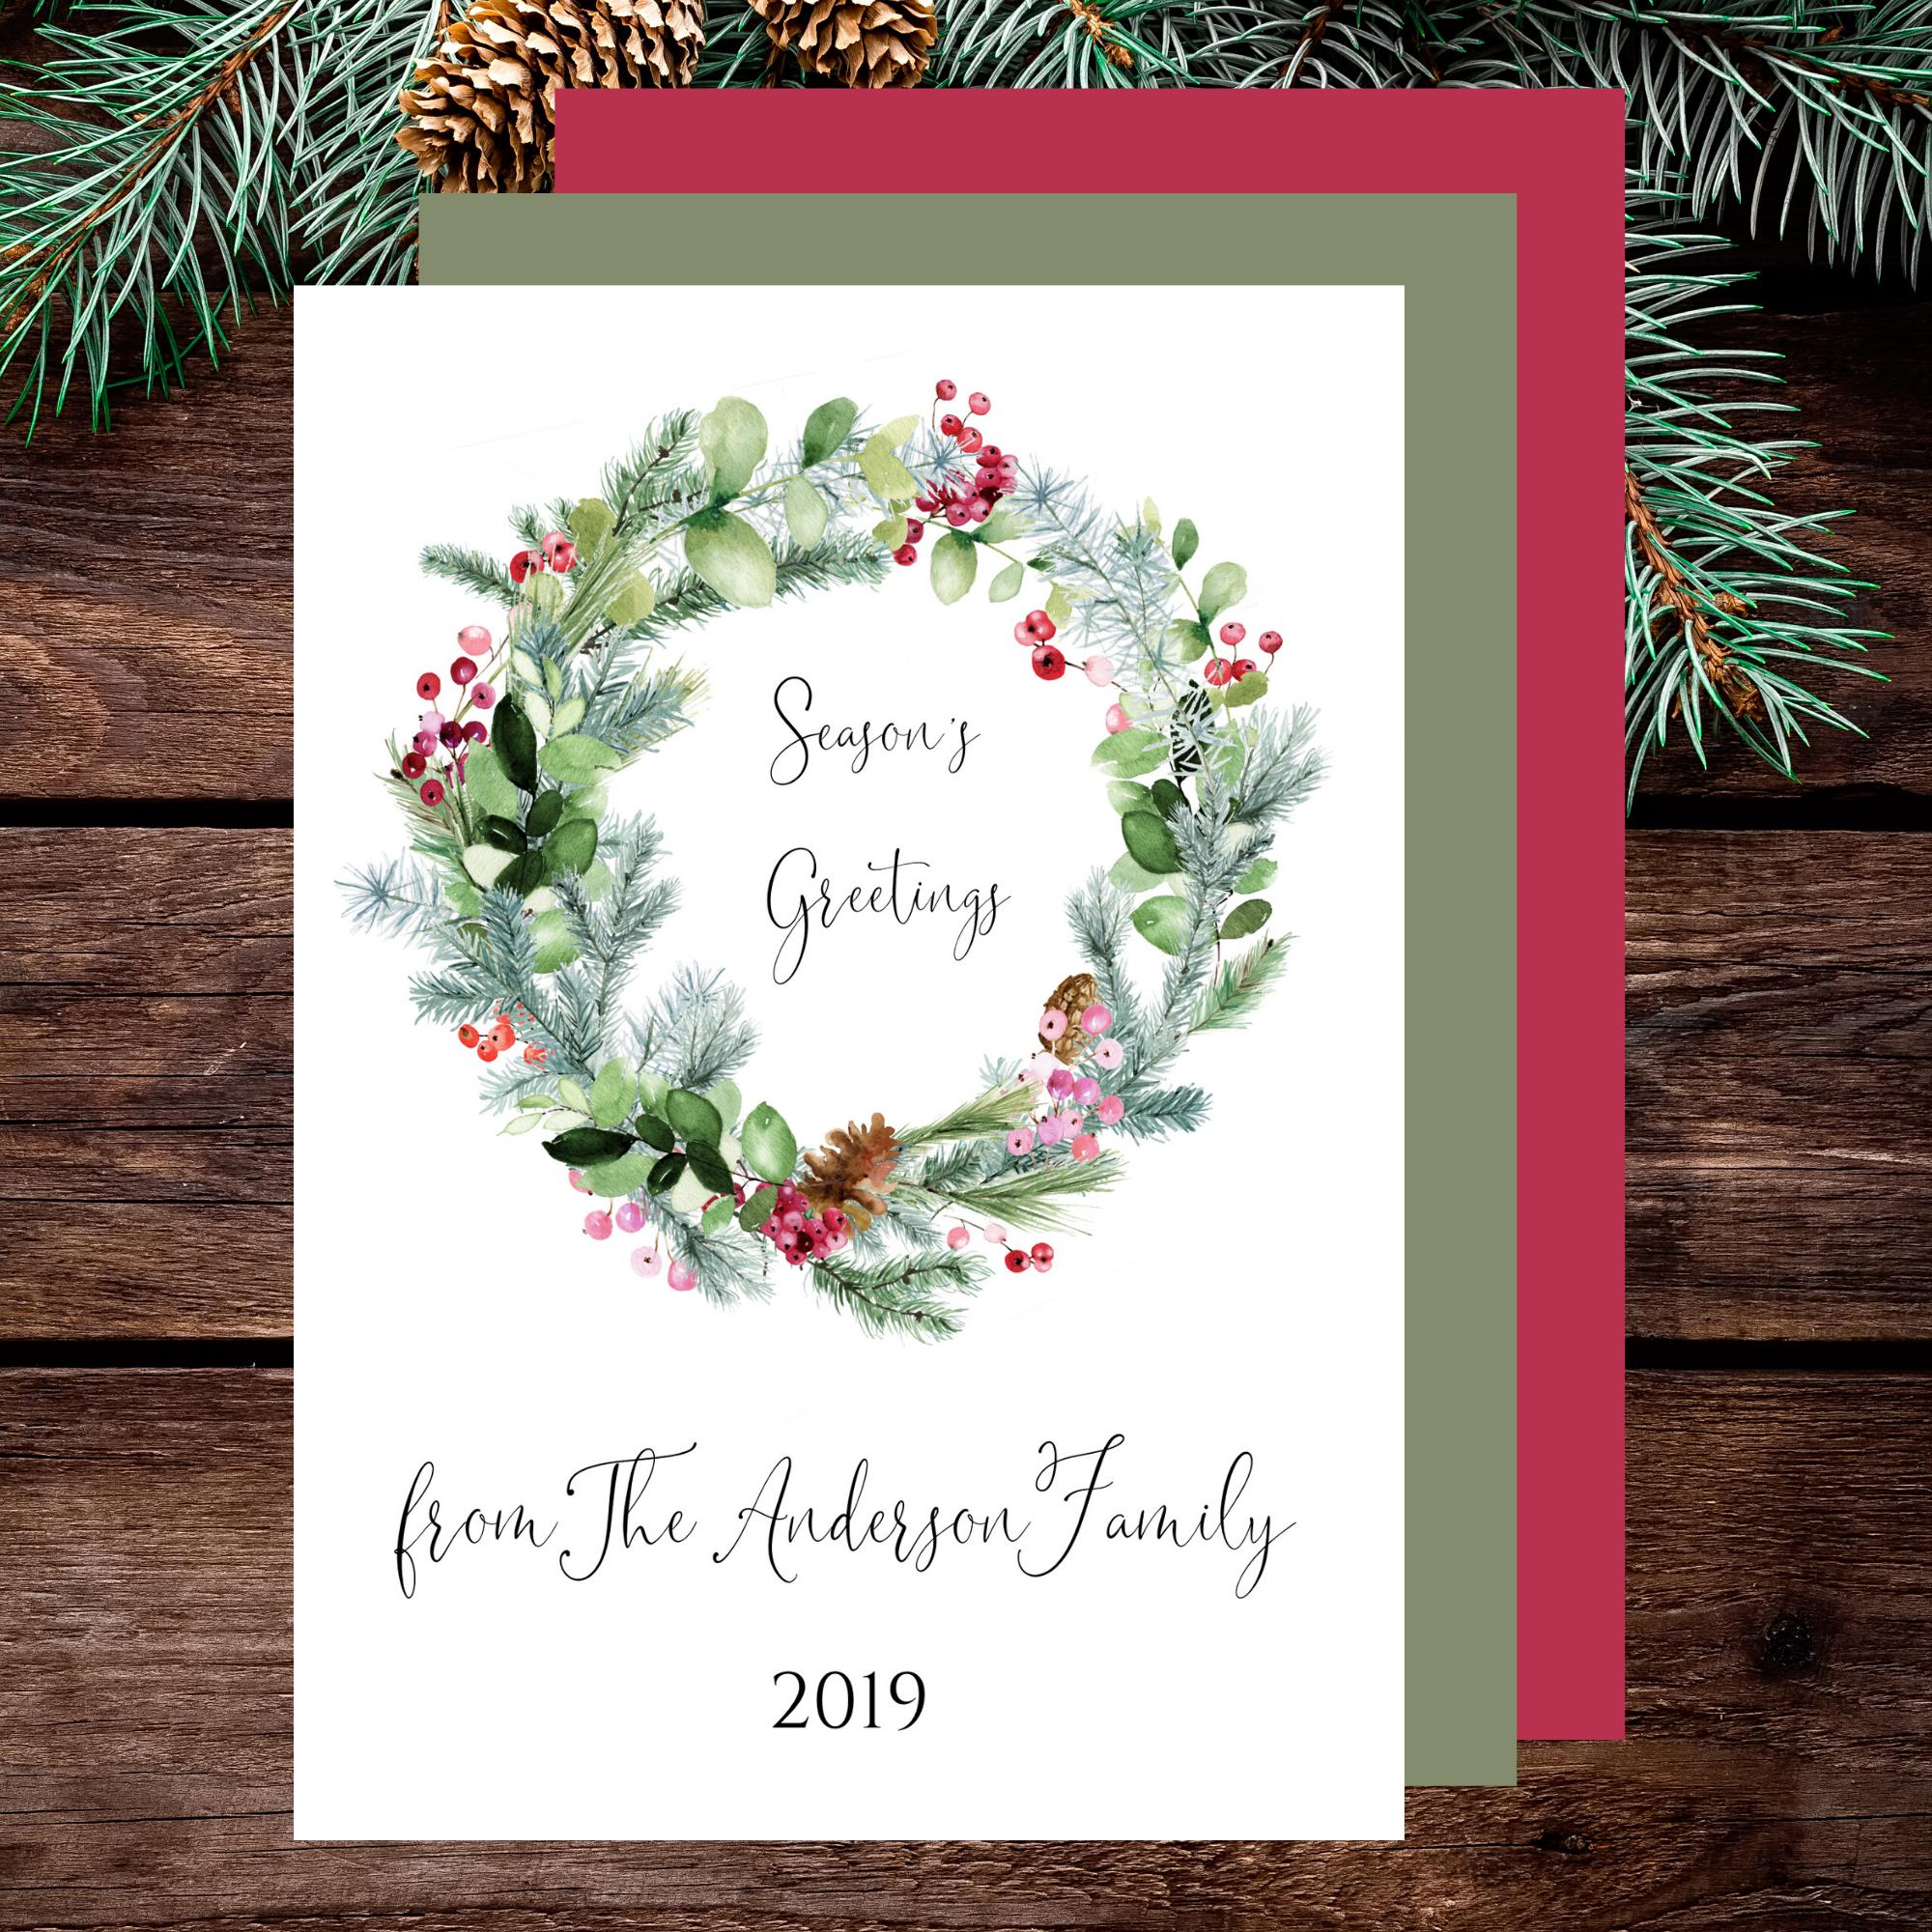 Christmas Card Template Editable With Canva 958172 Canva Templates Design Bundles Christmas Card Template Merry Christmas Card Christmas Cards